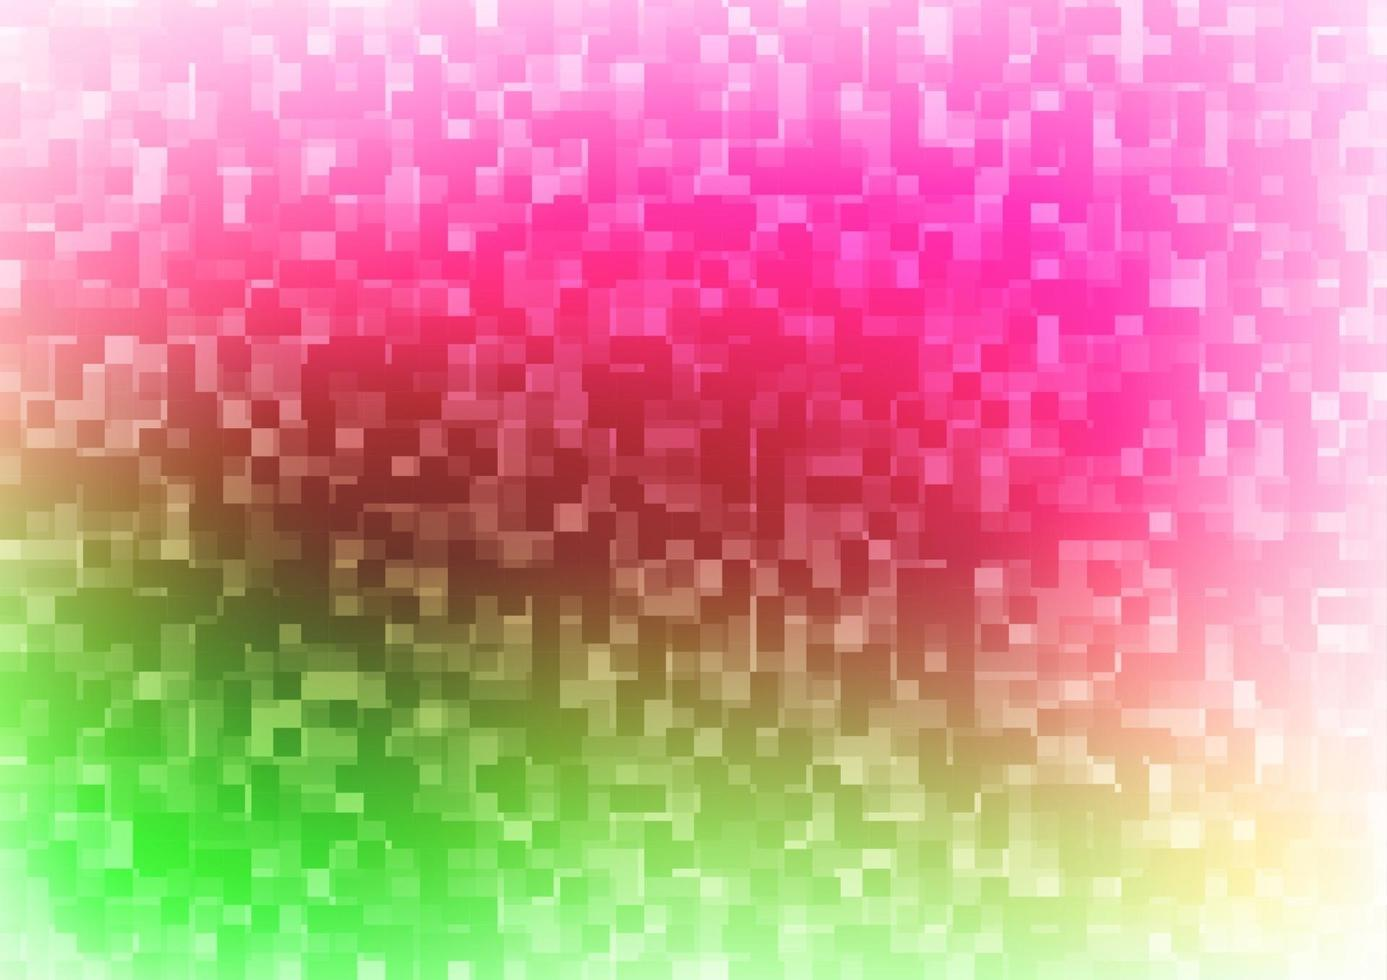 capa de vetor rosa claro verde em estilo poligonal.